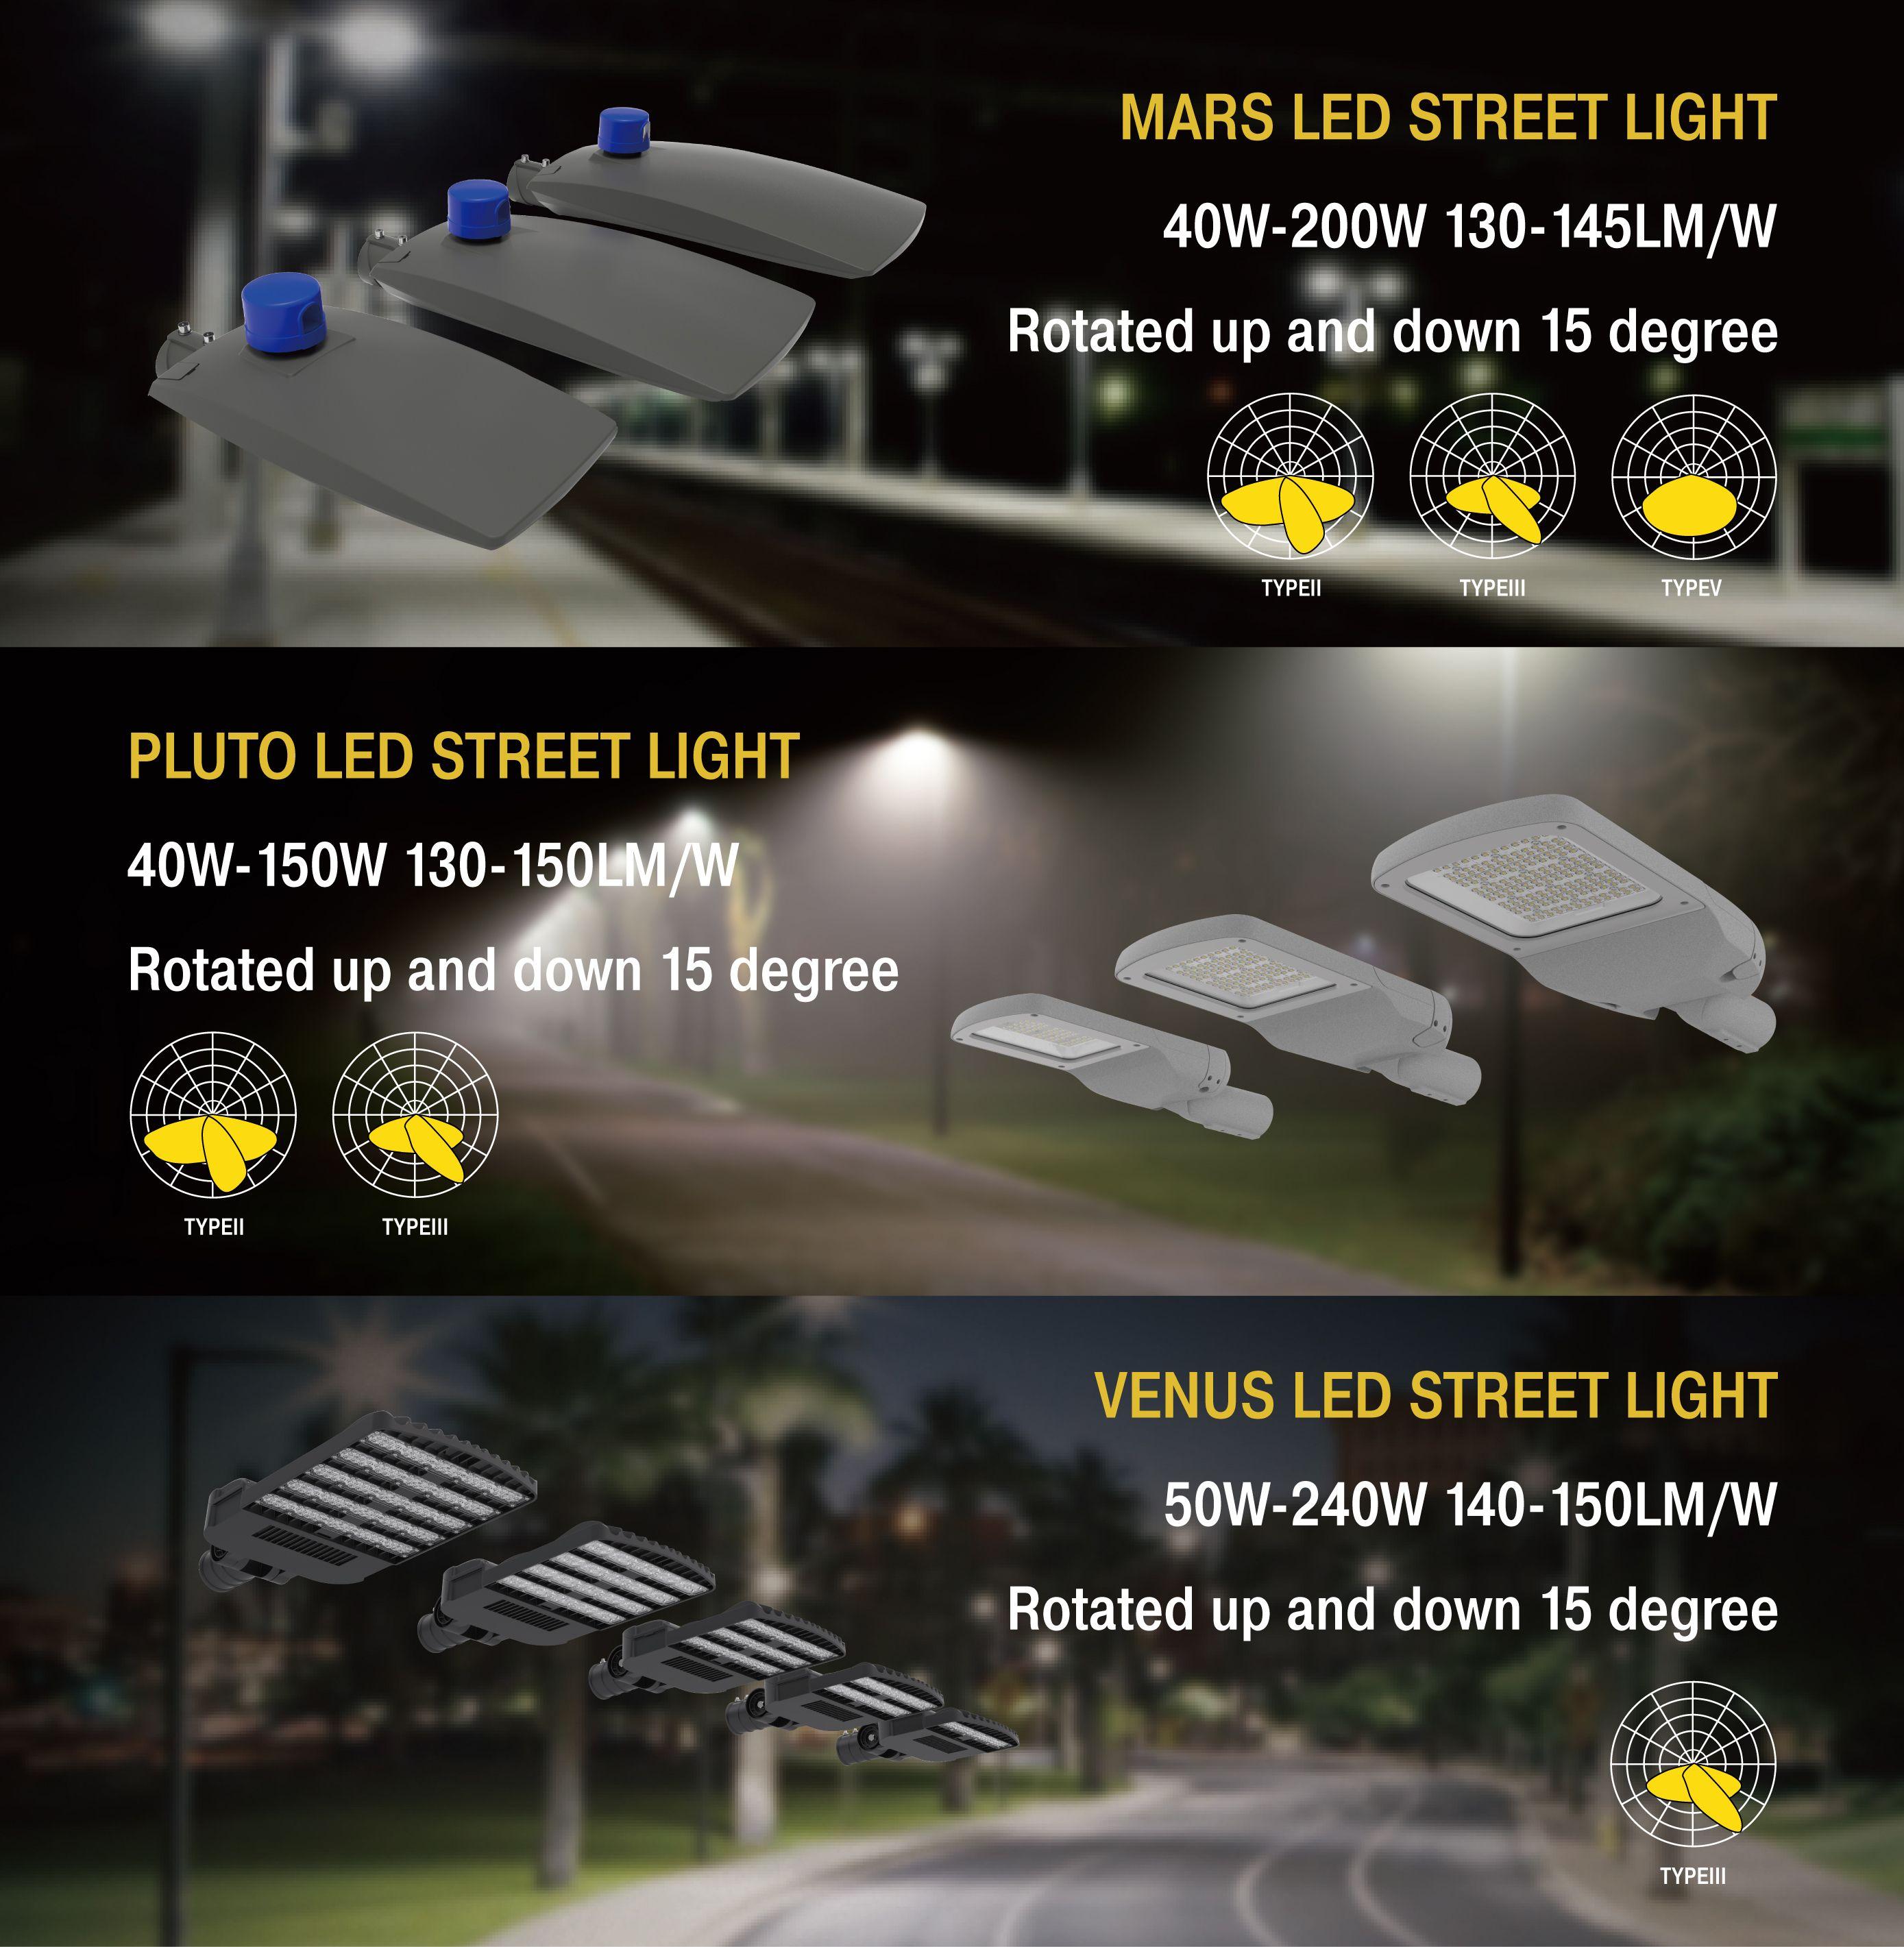 Led Street Lights Light Fixtures